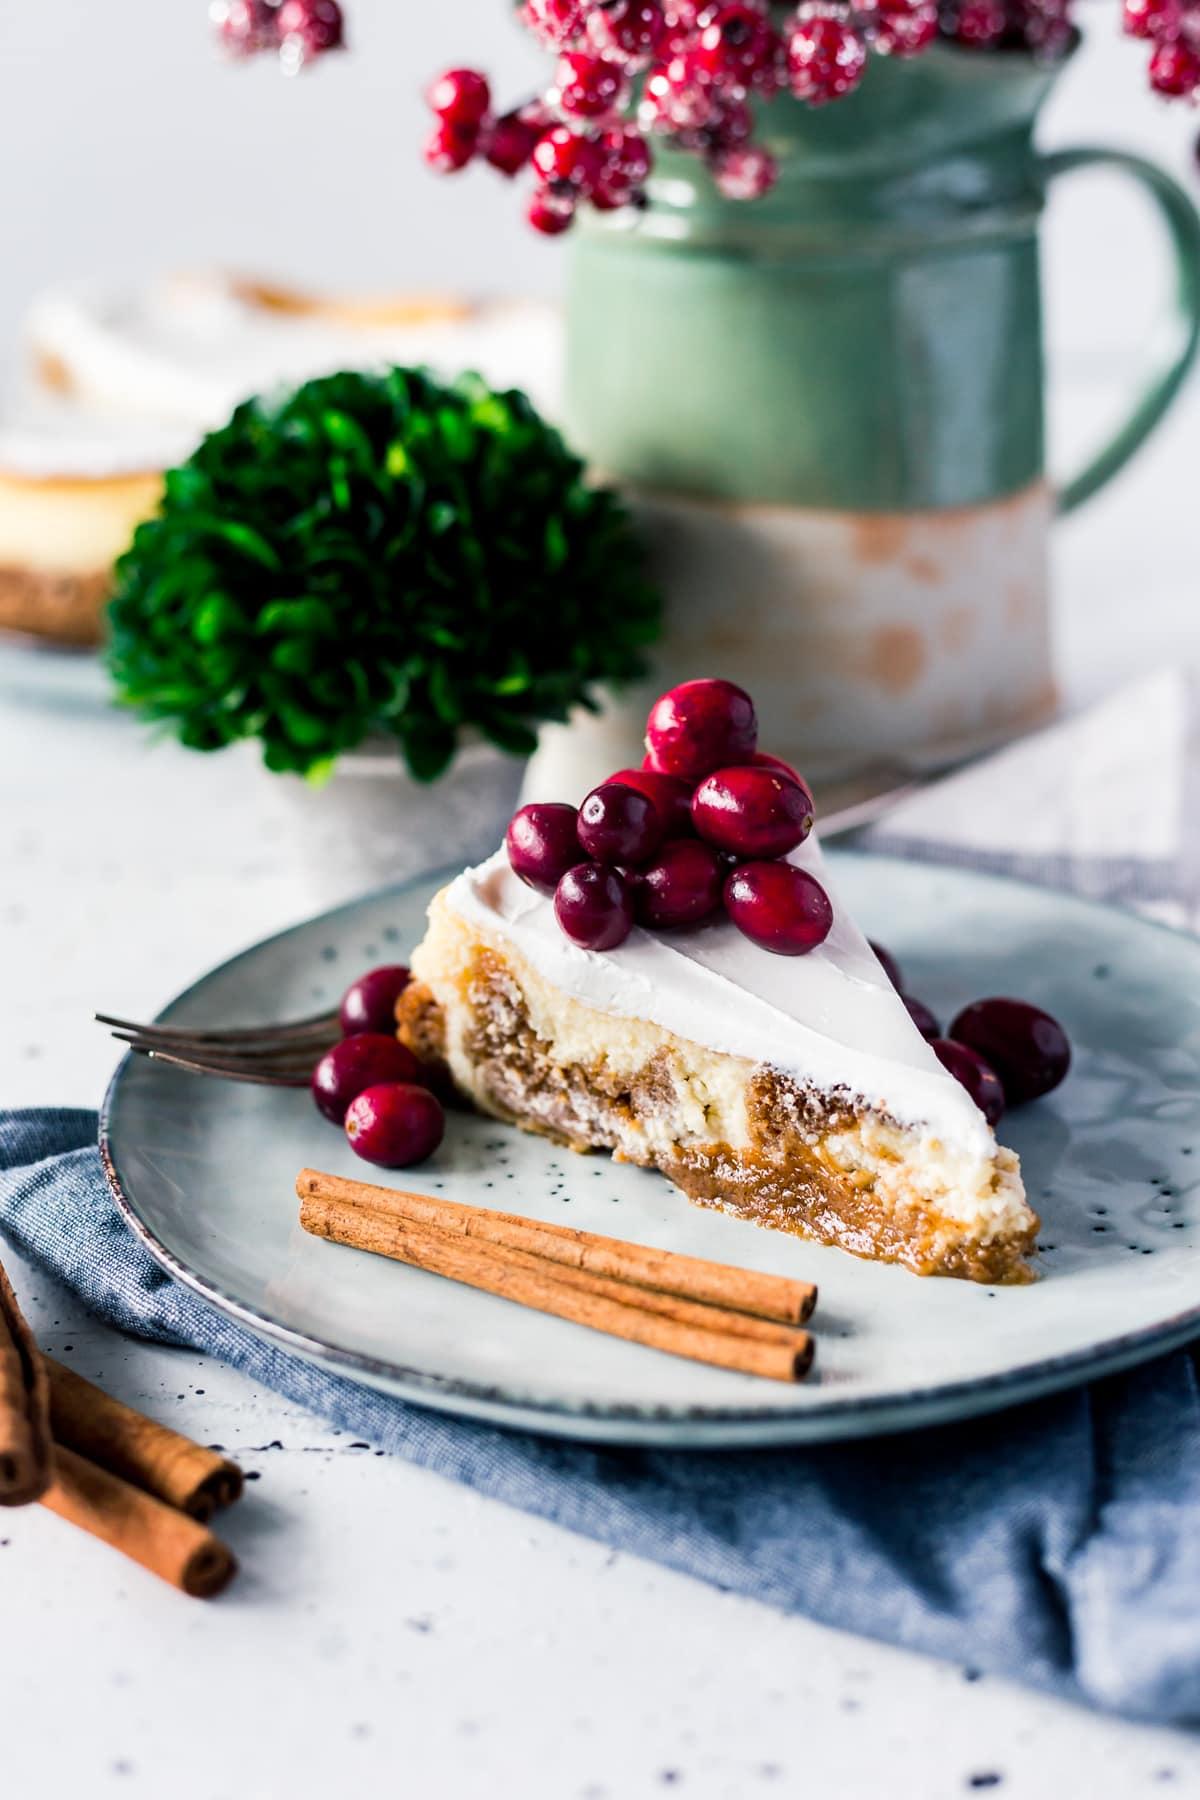 Amazing Dessert: Pumpkin Pie Cheesecake (I promise you can make it!) // PrettyExtraordinary.com